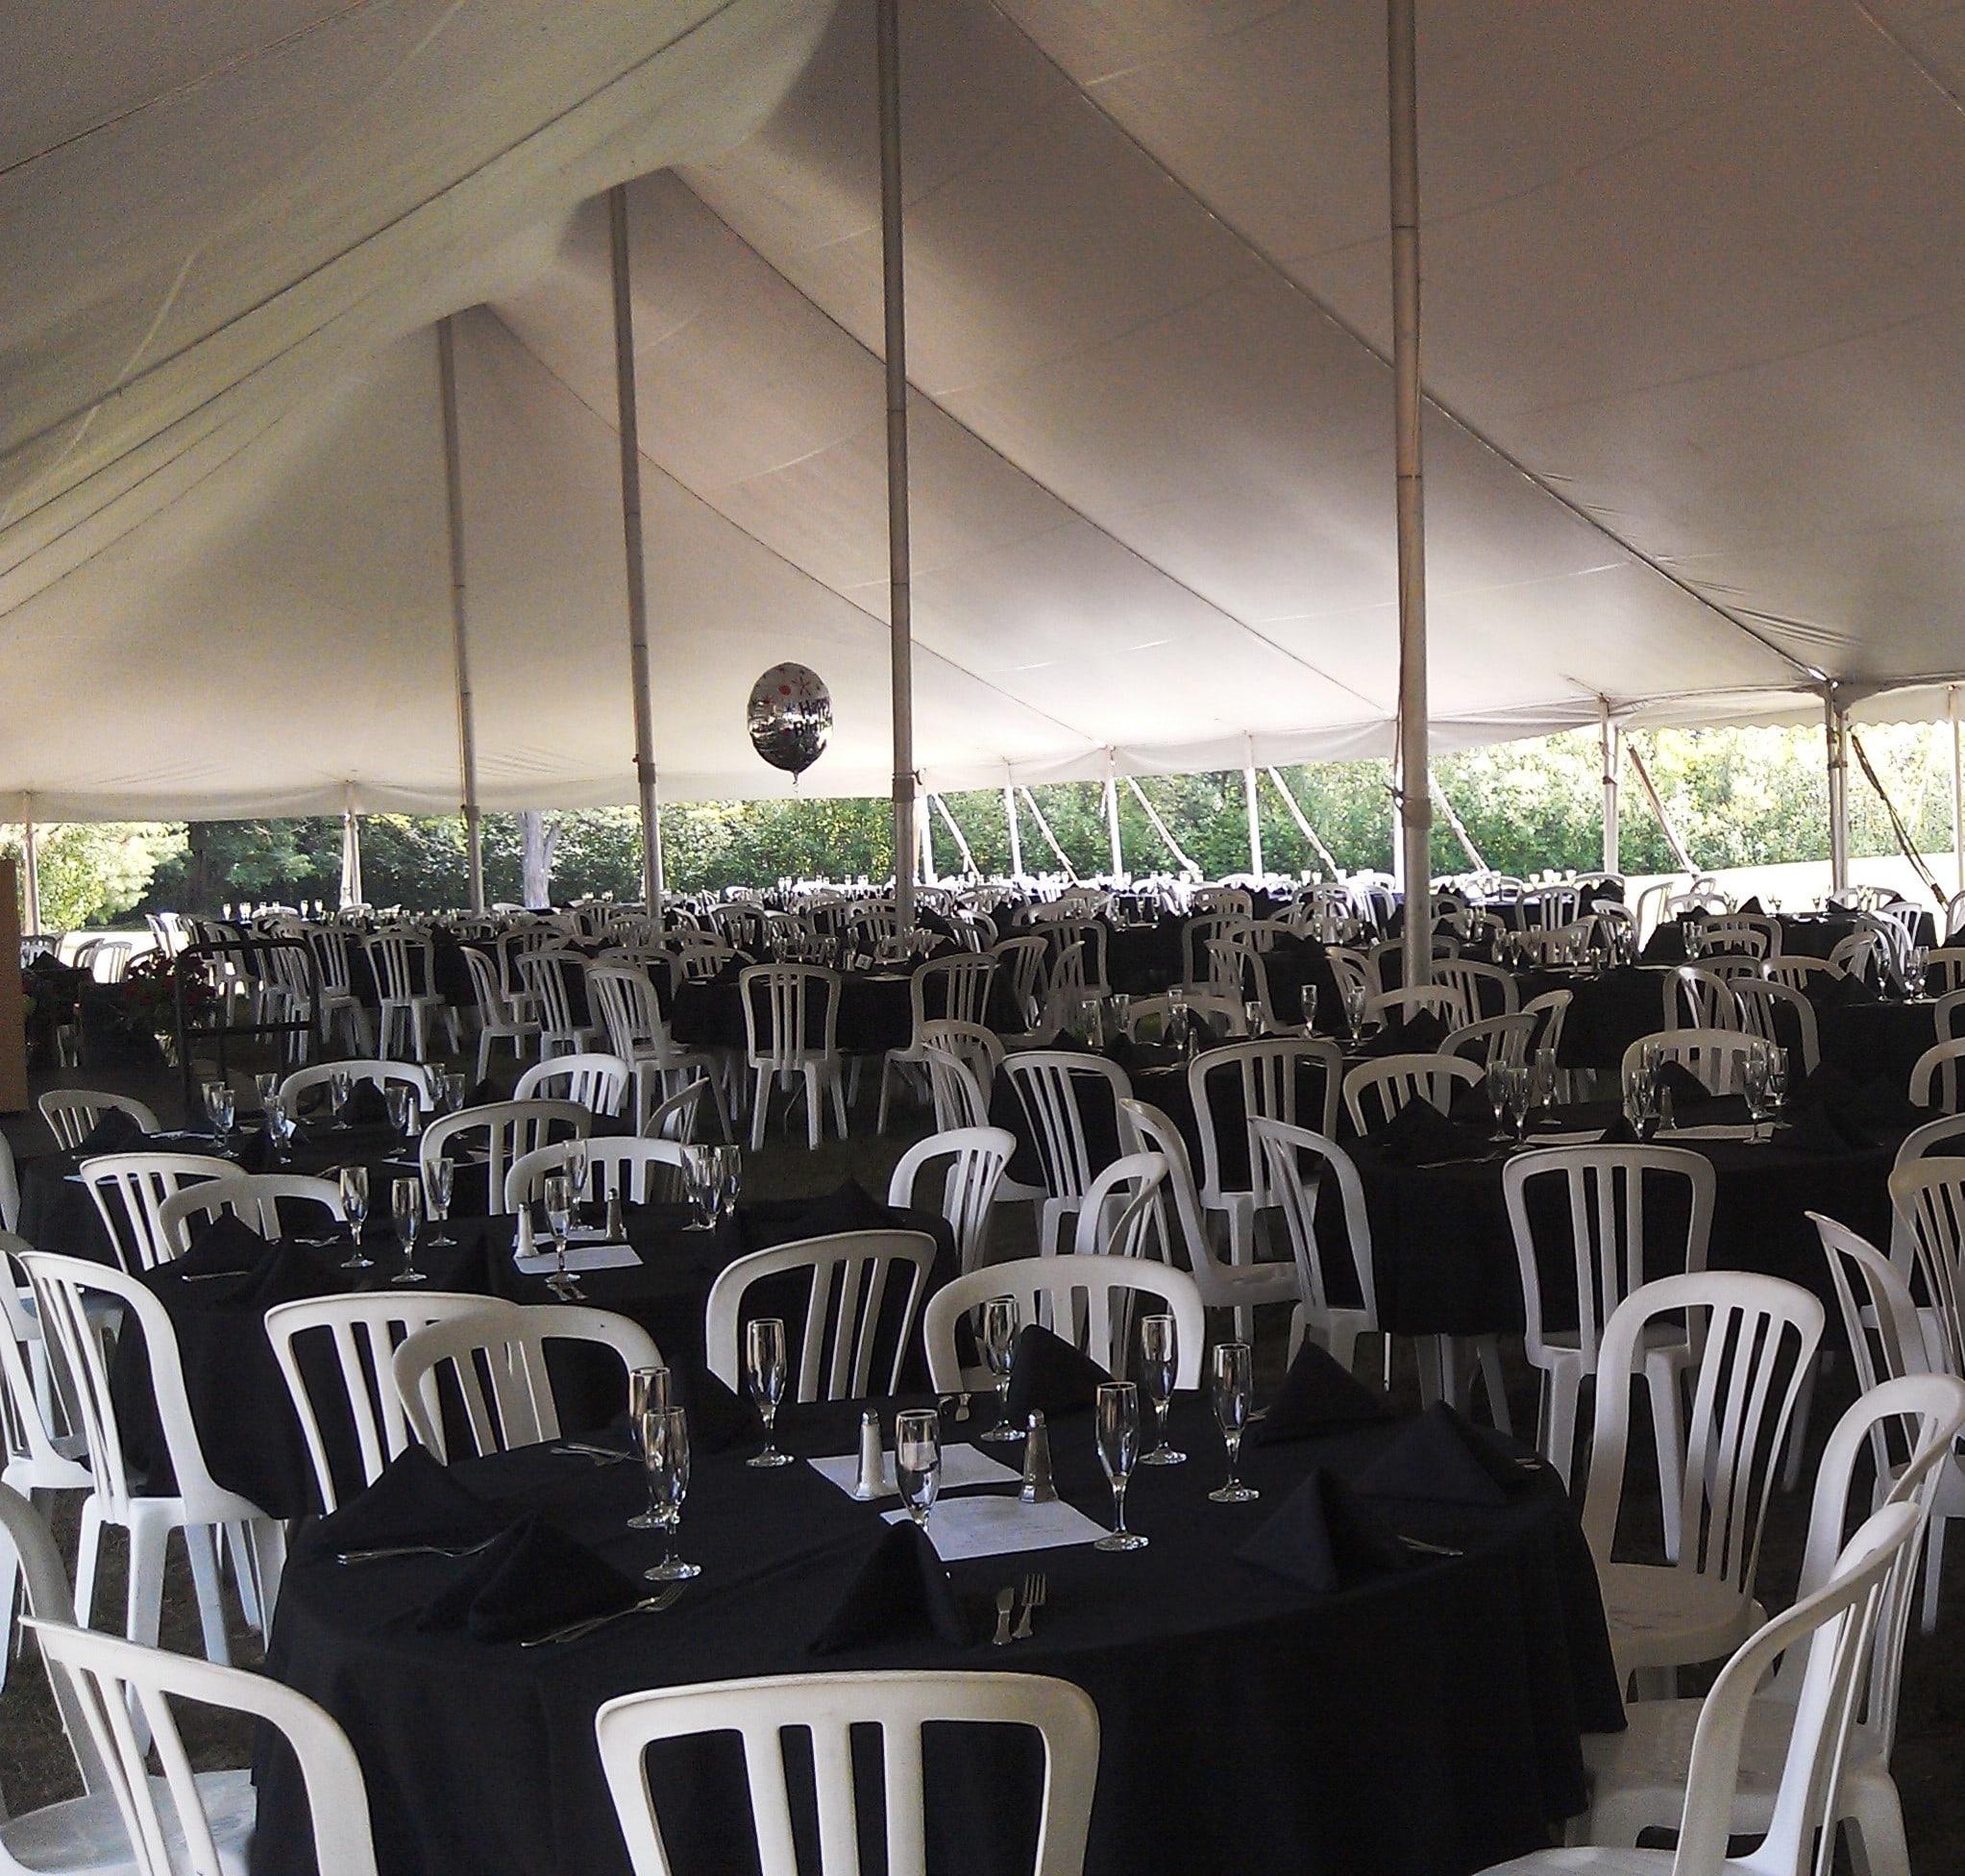 table and chair rental birmingham al larry kayak mi wedding event troy